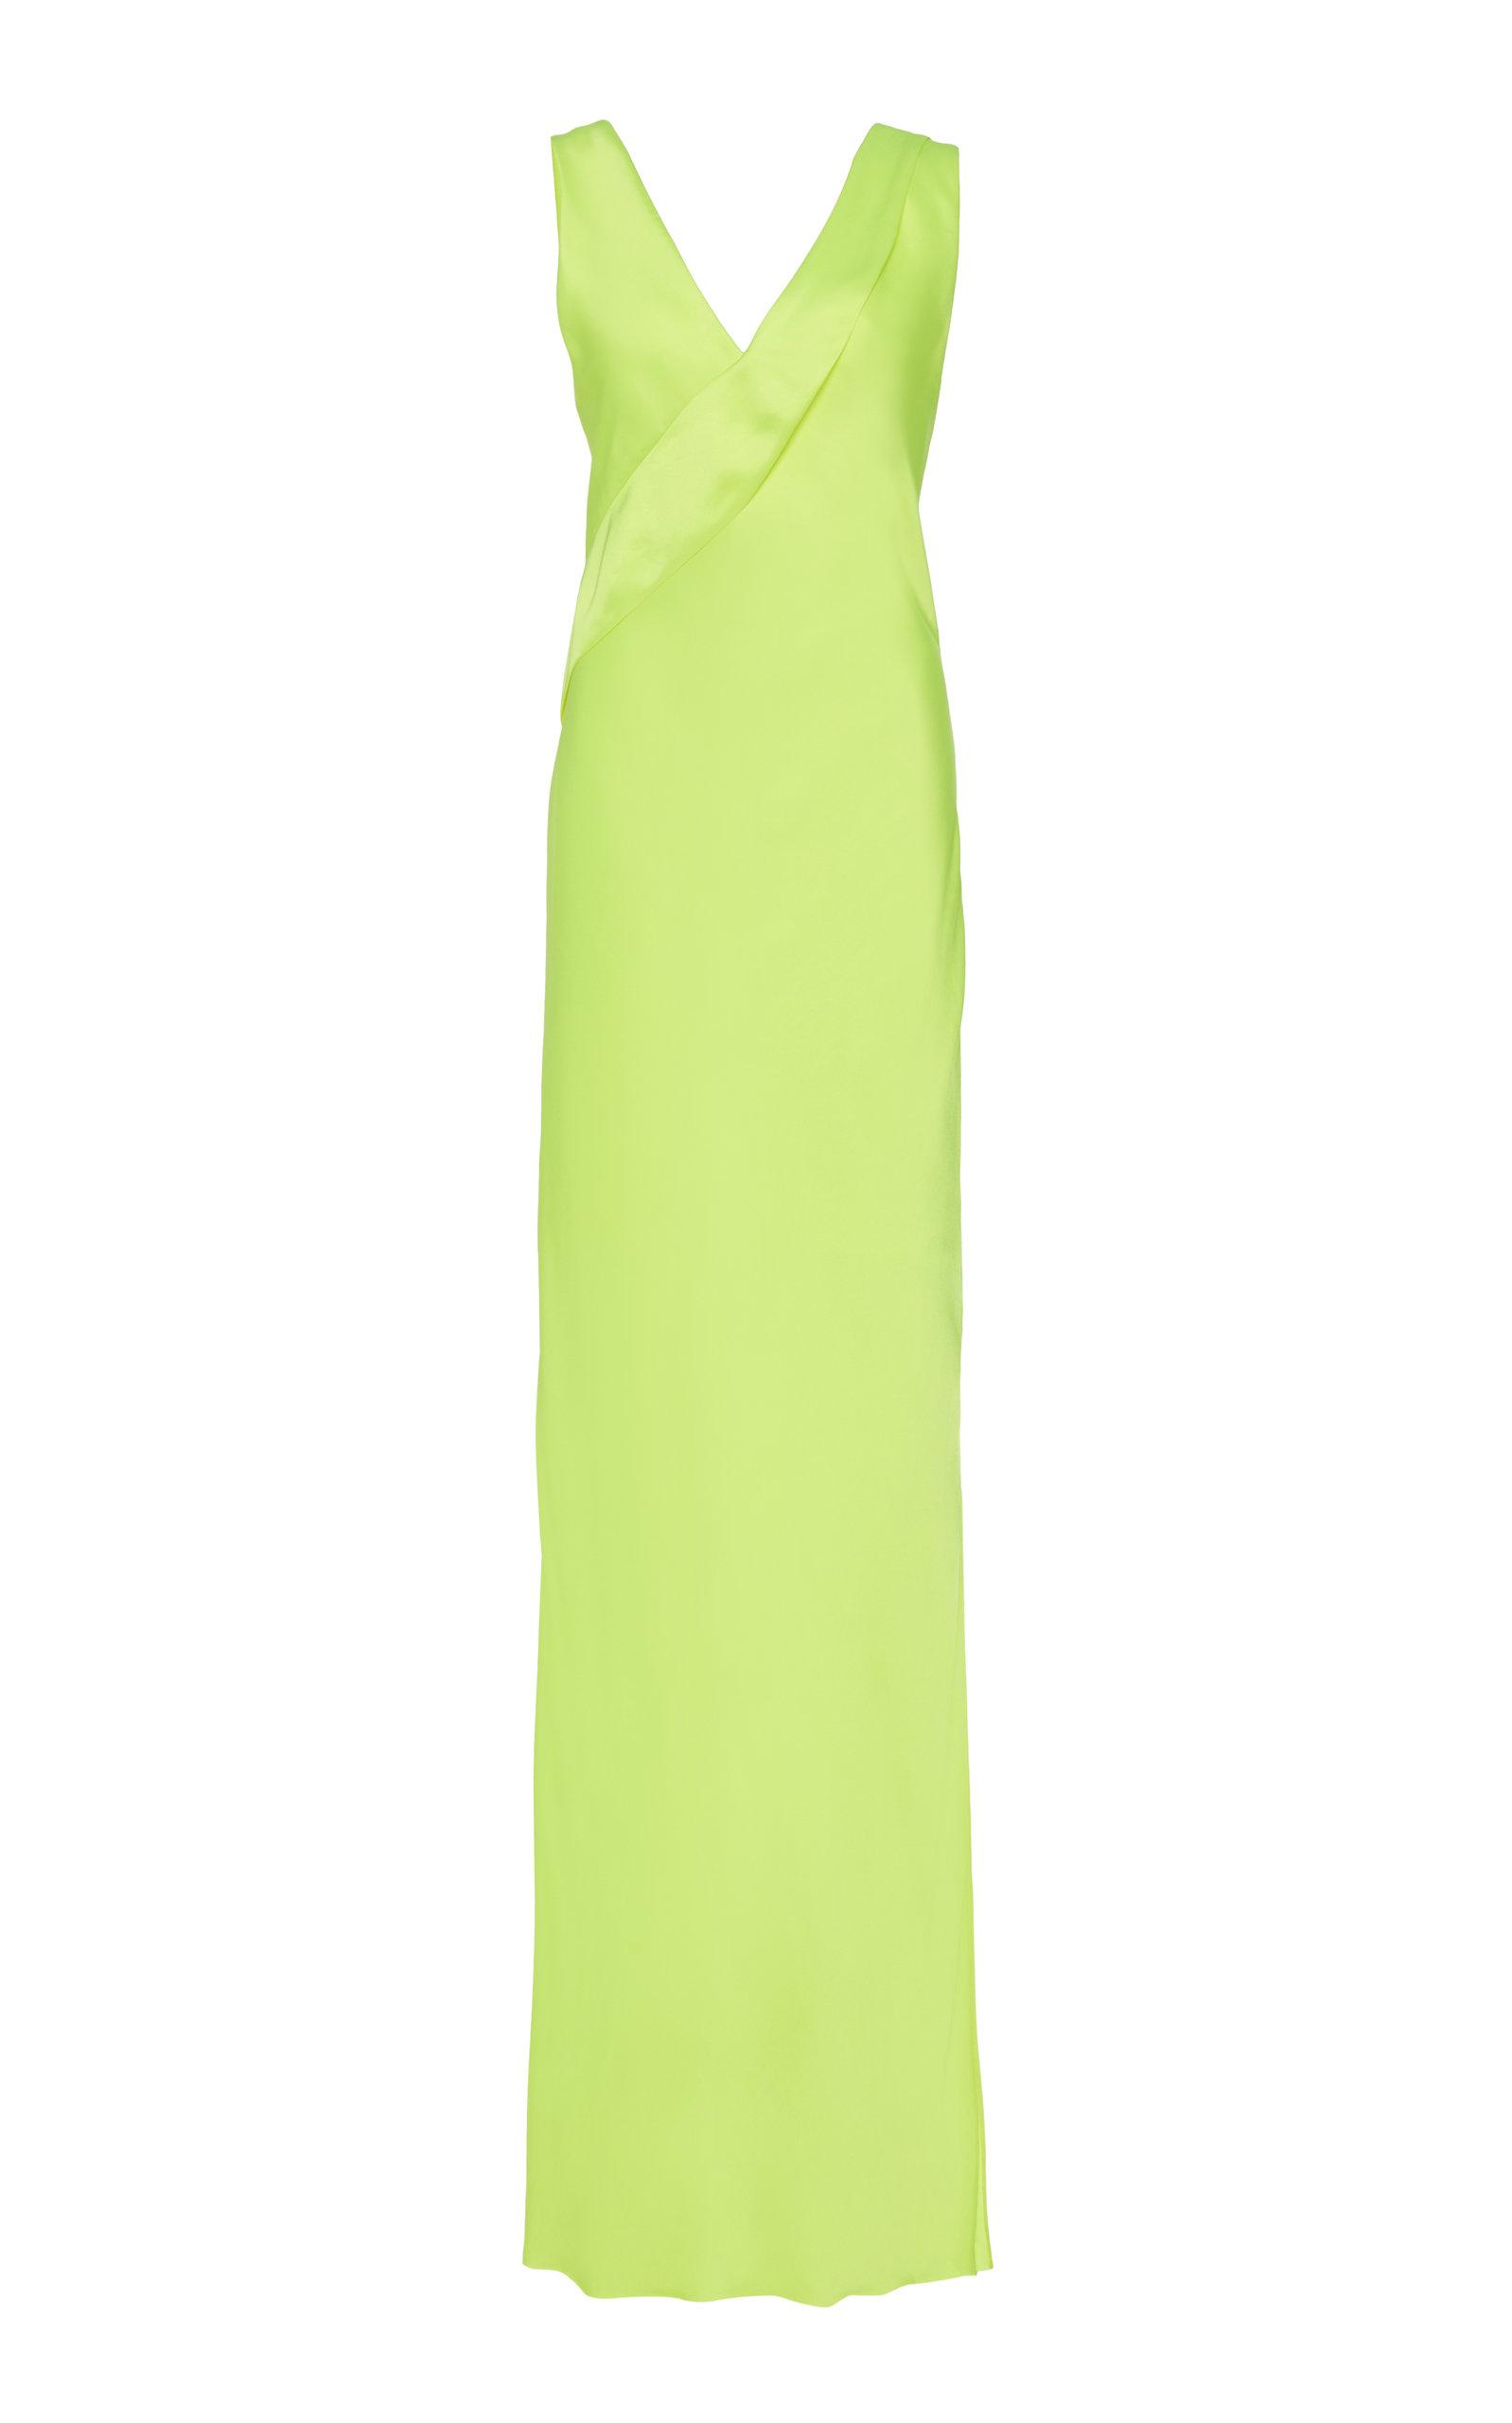 Buy Helmut Lang Sash-Detailed Duchess Satin Dress online, shop Helmut Lang at the best price